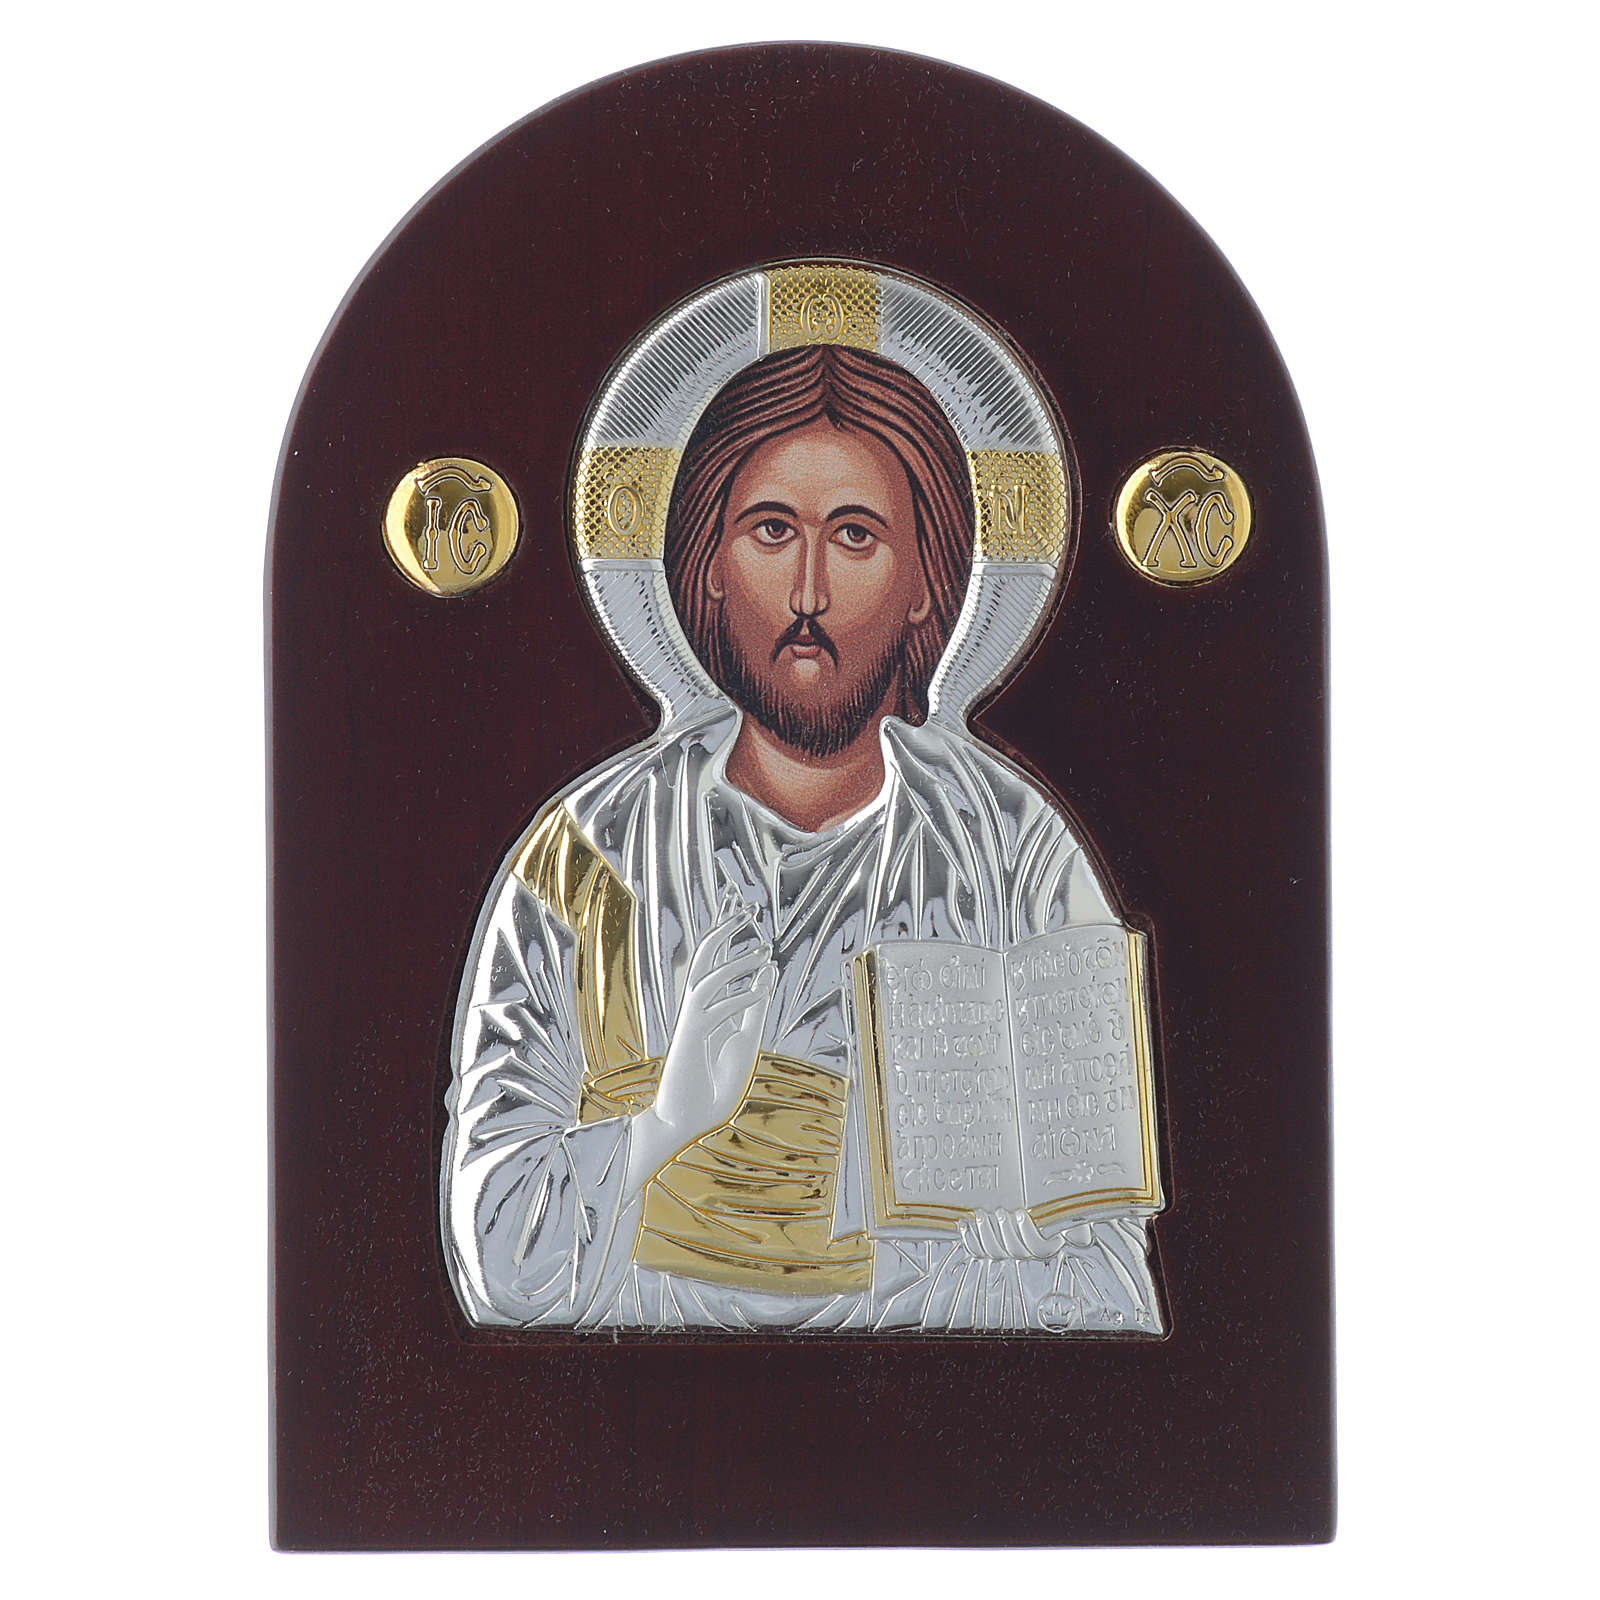 Icona Cristo Pantocratore 14x10 cm argento 925 finiture dorate 4